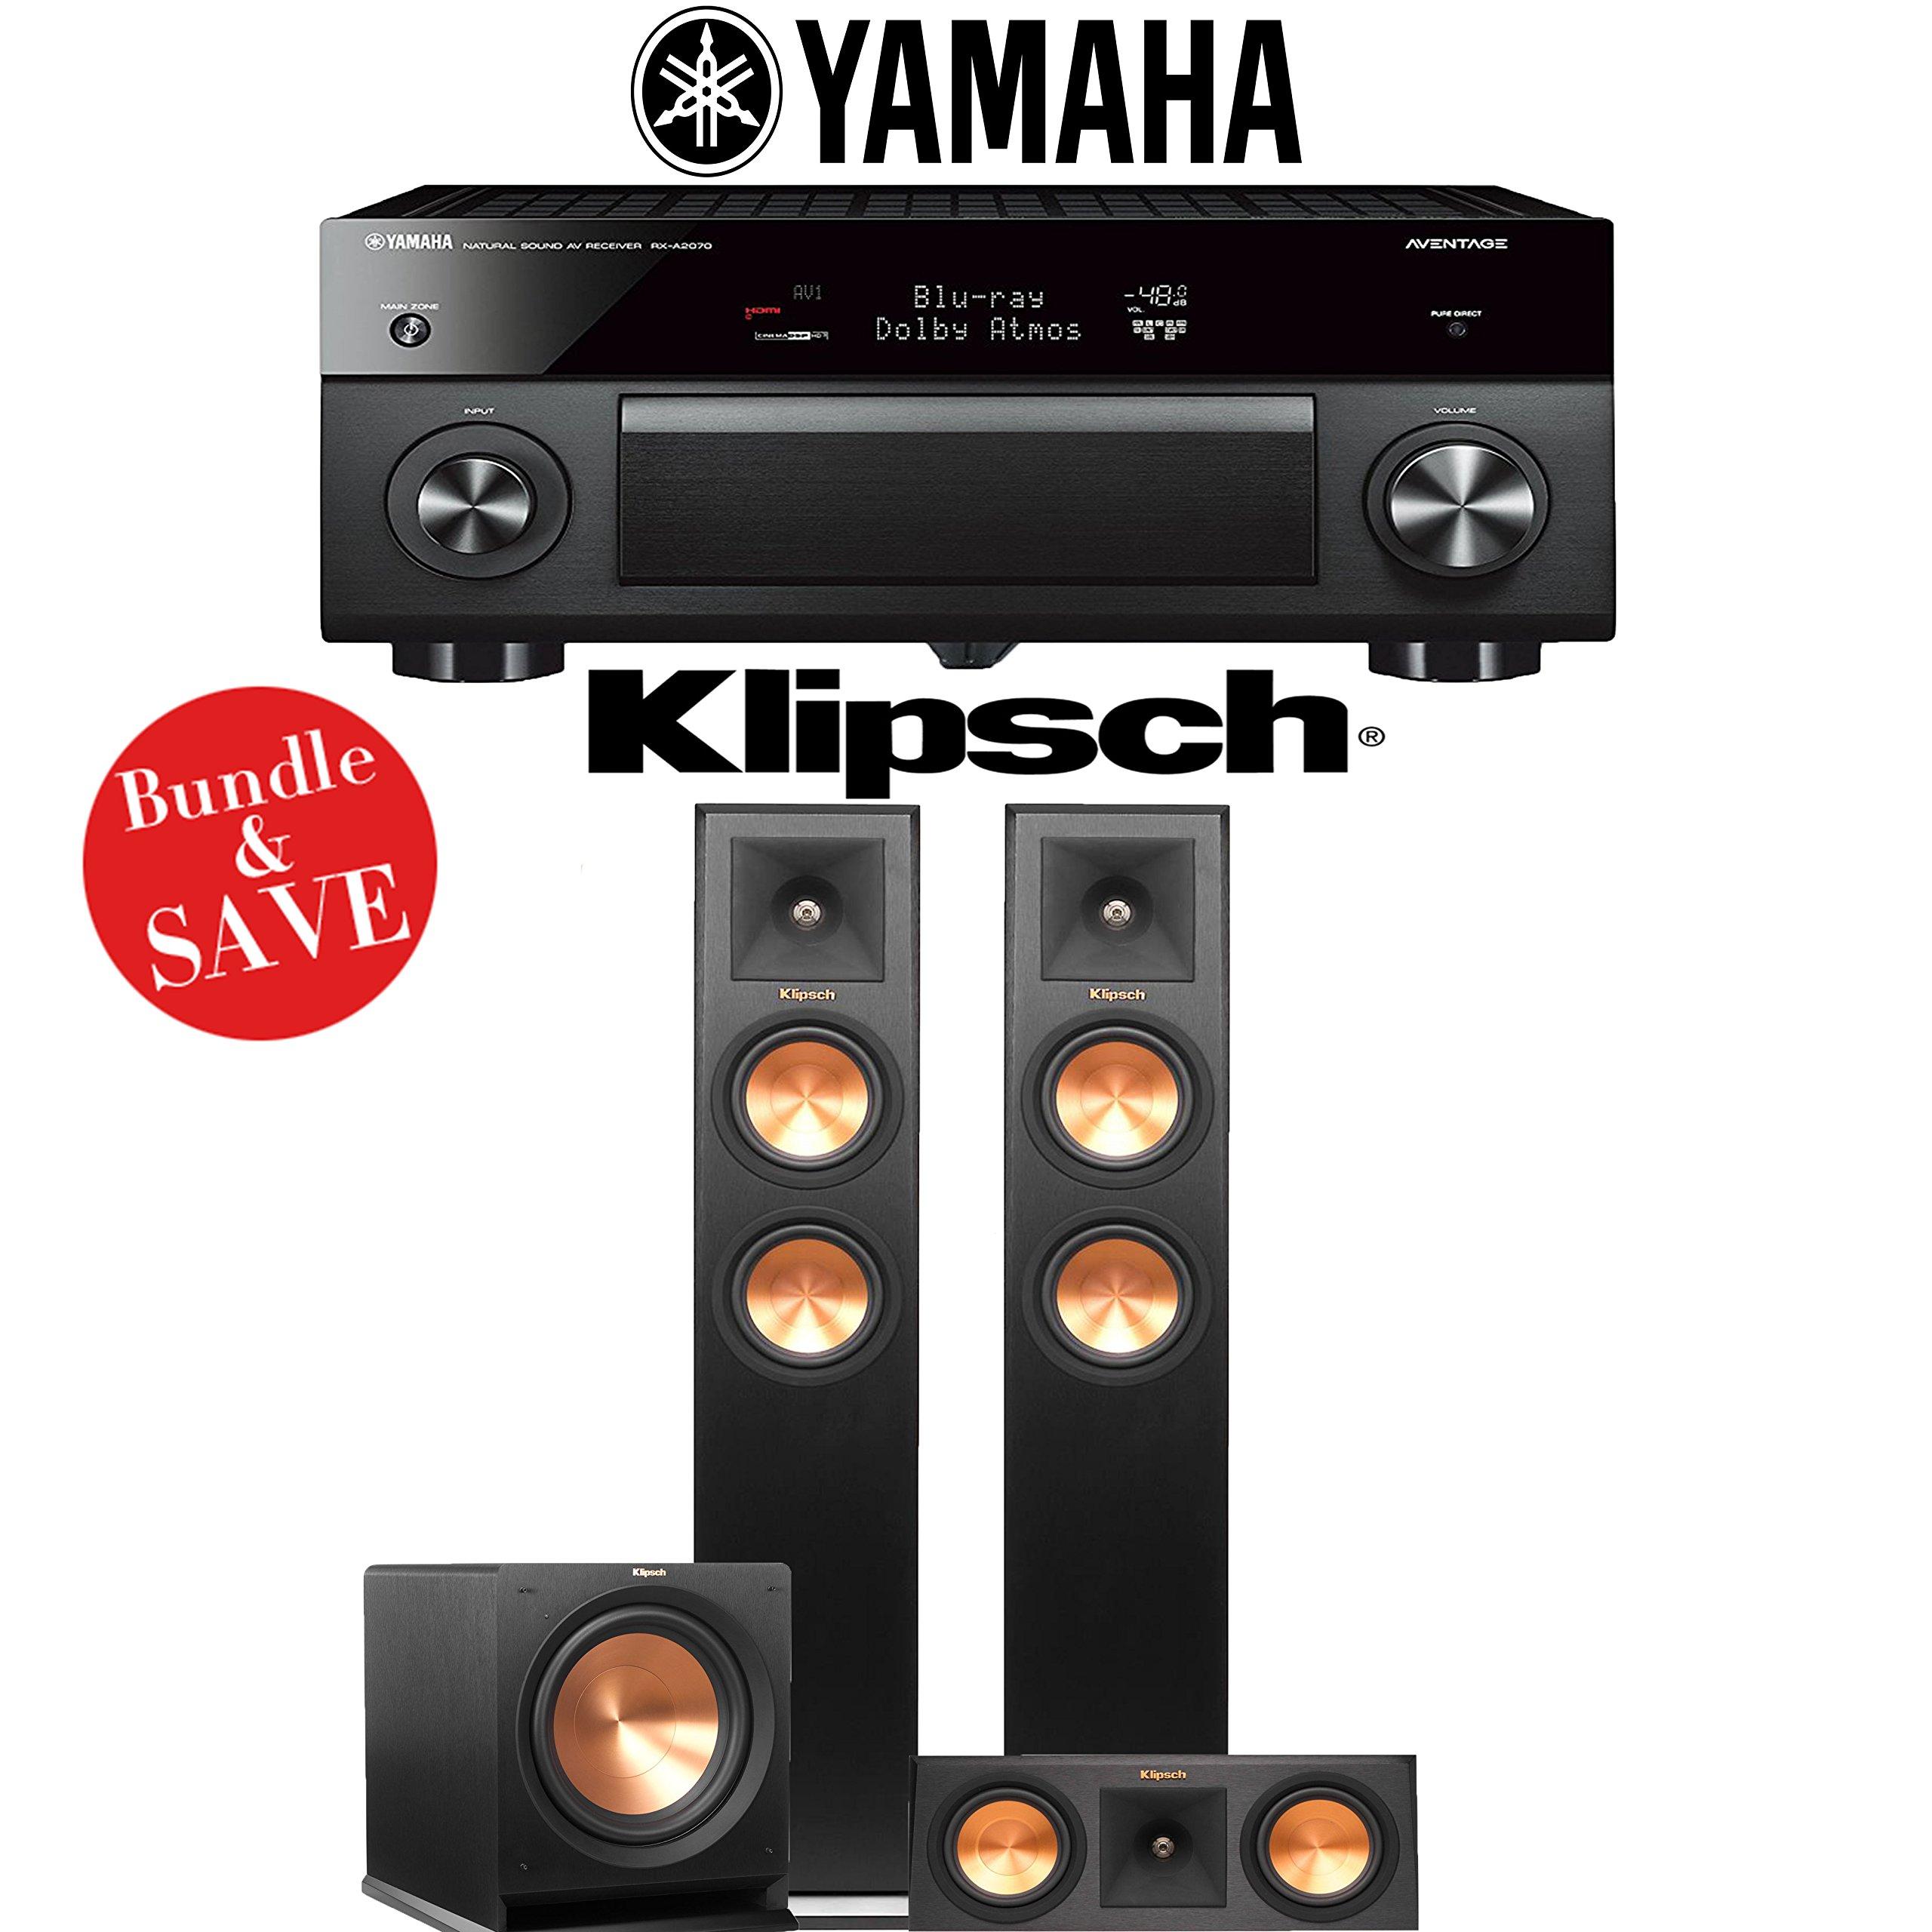 Yamaha AVENTAGE RX-A2070BL 9.2-Ch 4K Network AV Receiver + Klipsch RP-250F + Klipsch RP-250C + Klipsch R-112SW - 3.1-Ch Home Theater Package by Yamaha